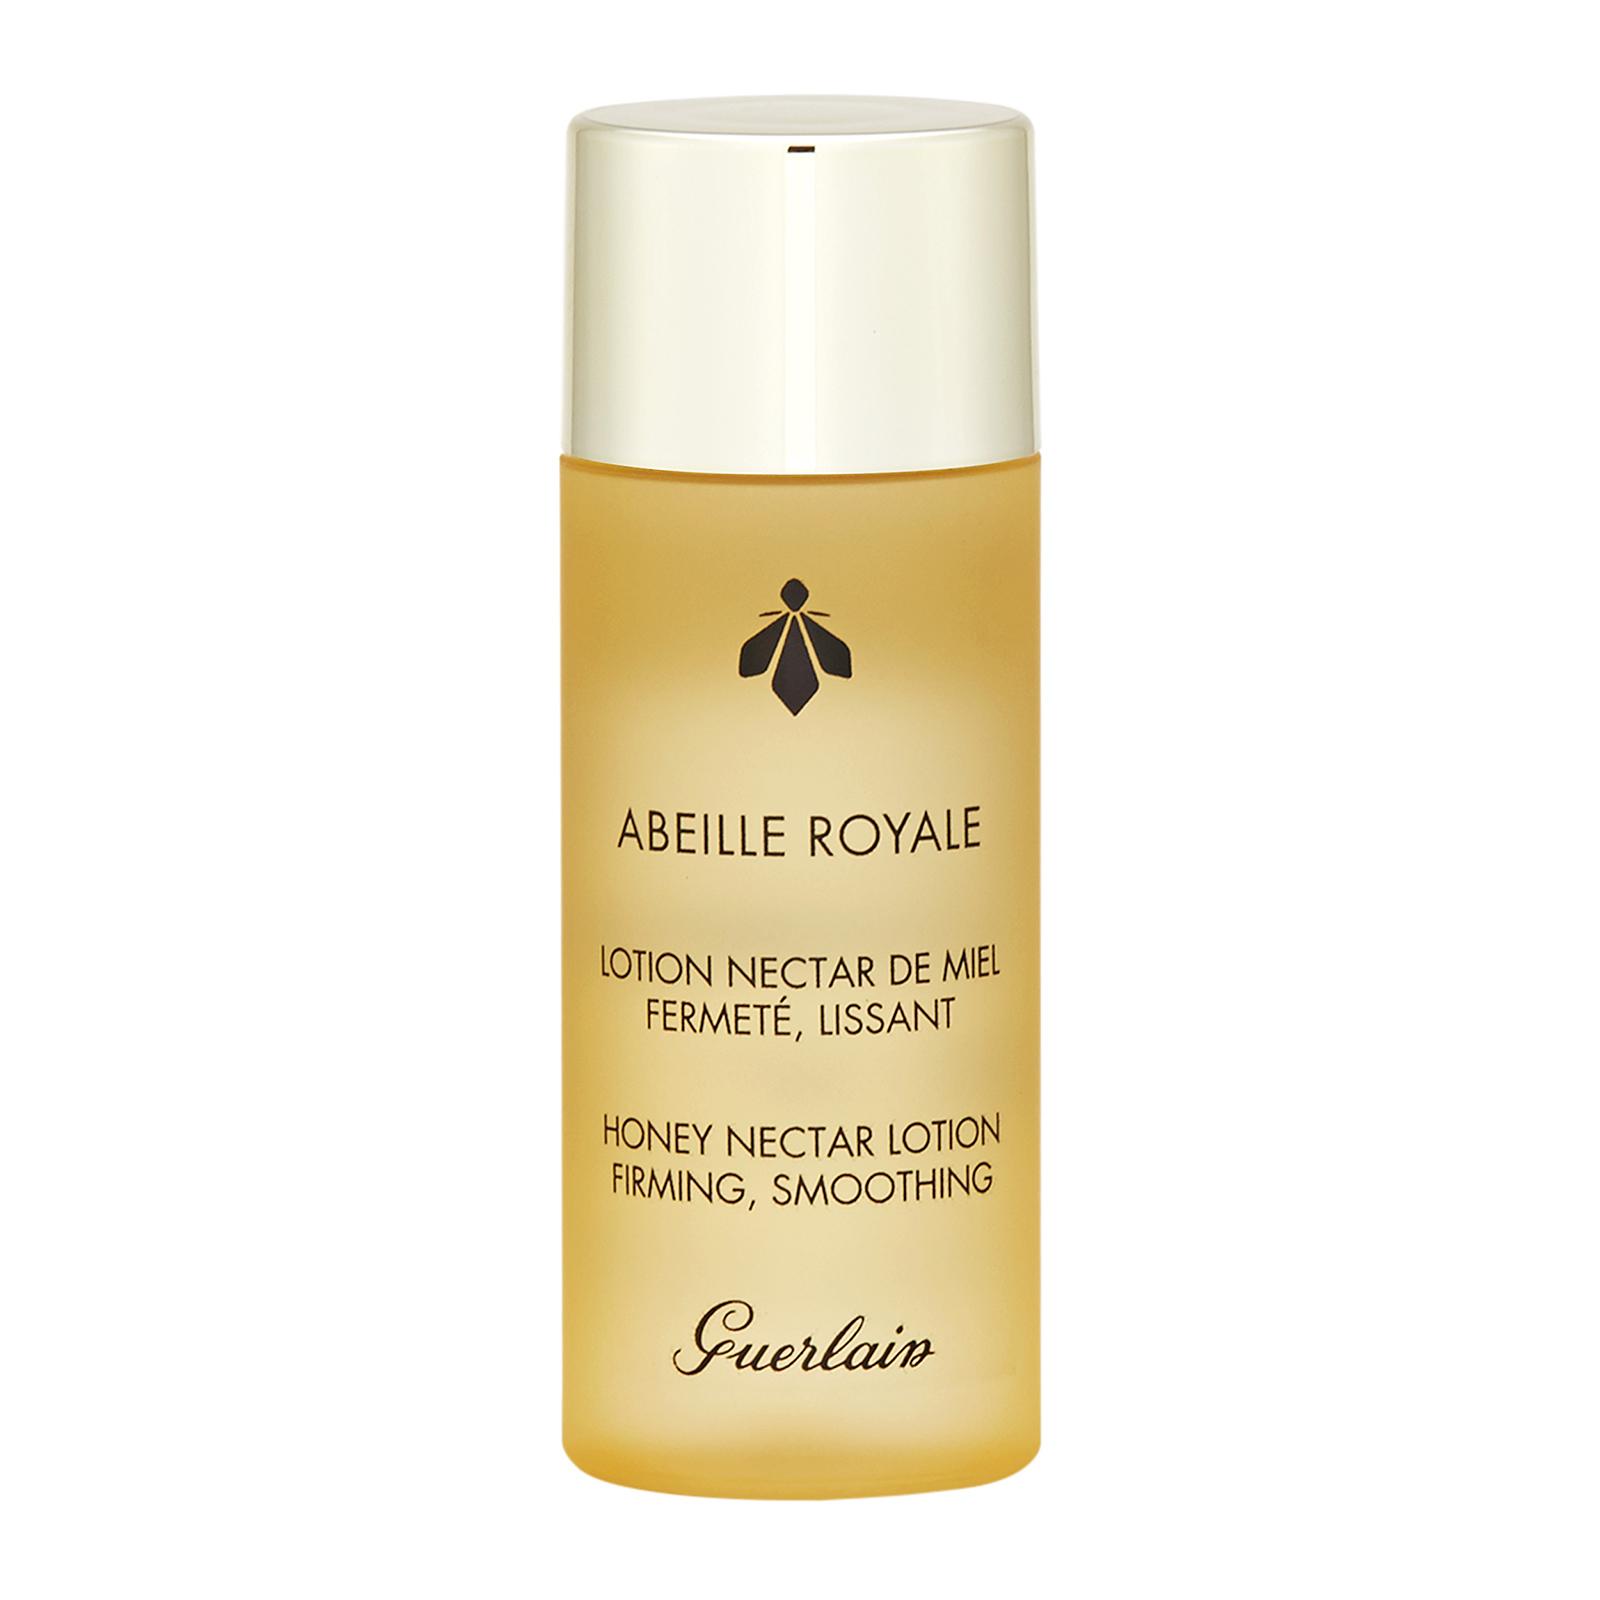 Guerlain Abeille Royale  Honey Nectar Lotion 1.3oz, 40ml from Cosme-De.com